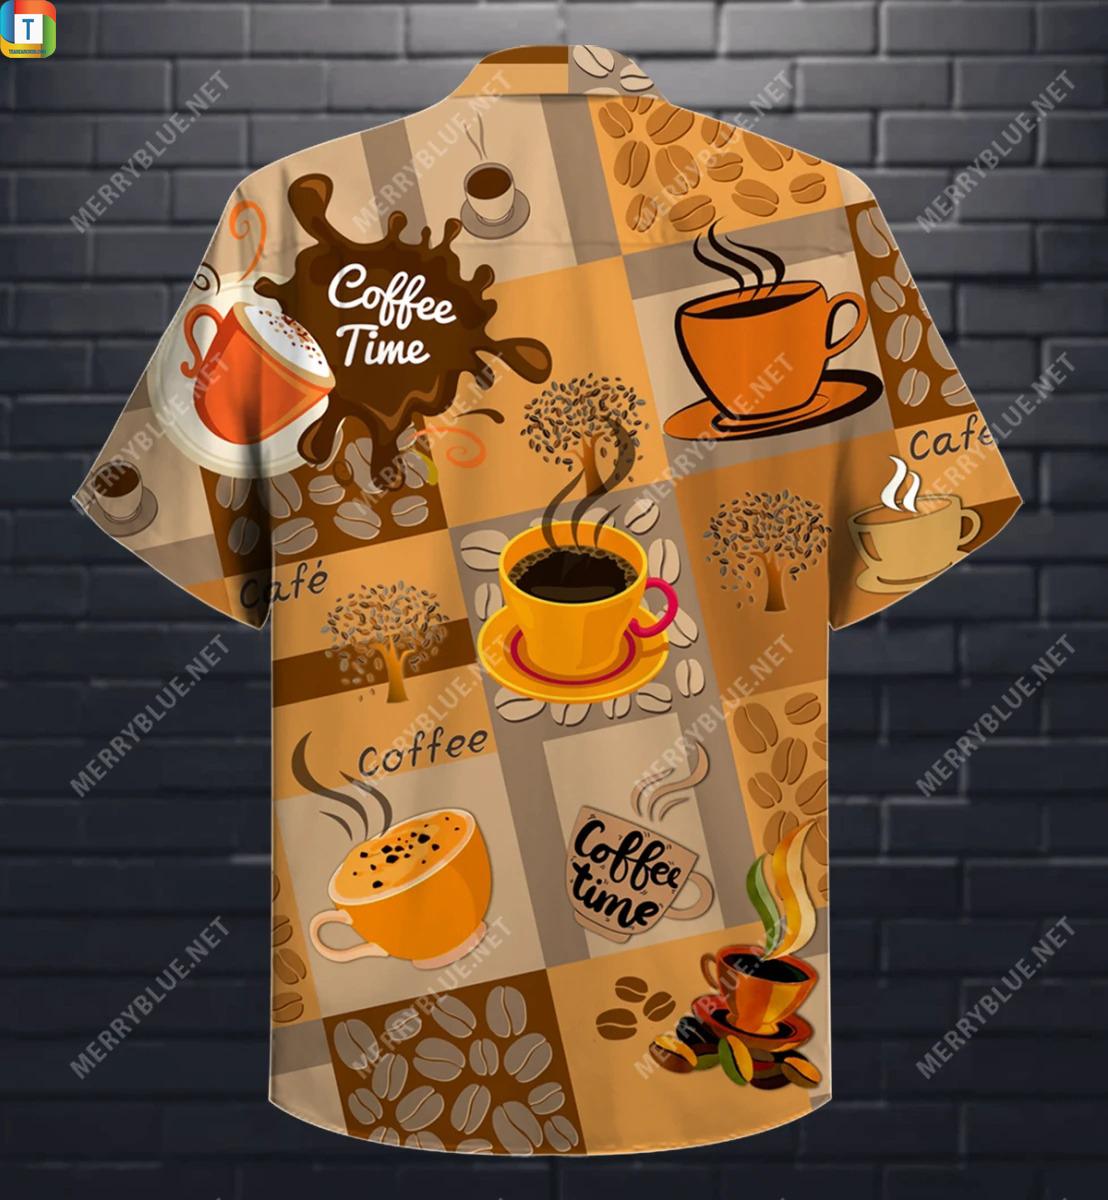 Coffee time makes life better hawaiian shirt 2